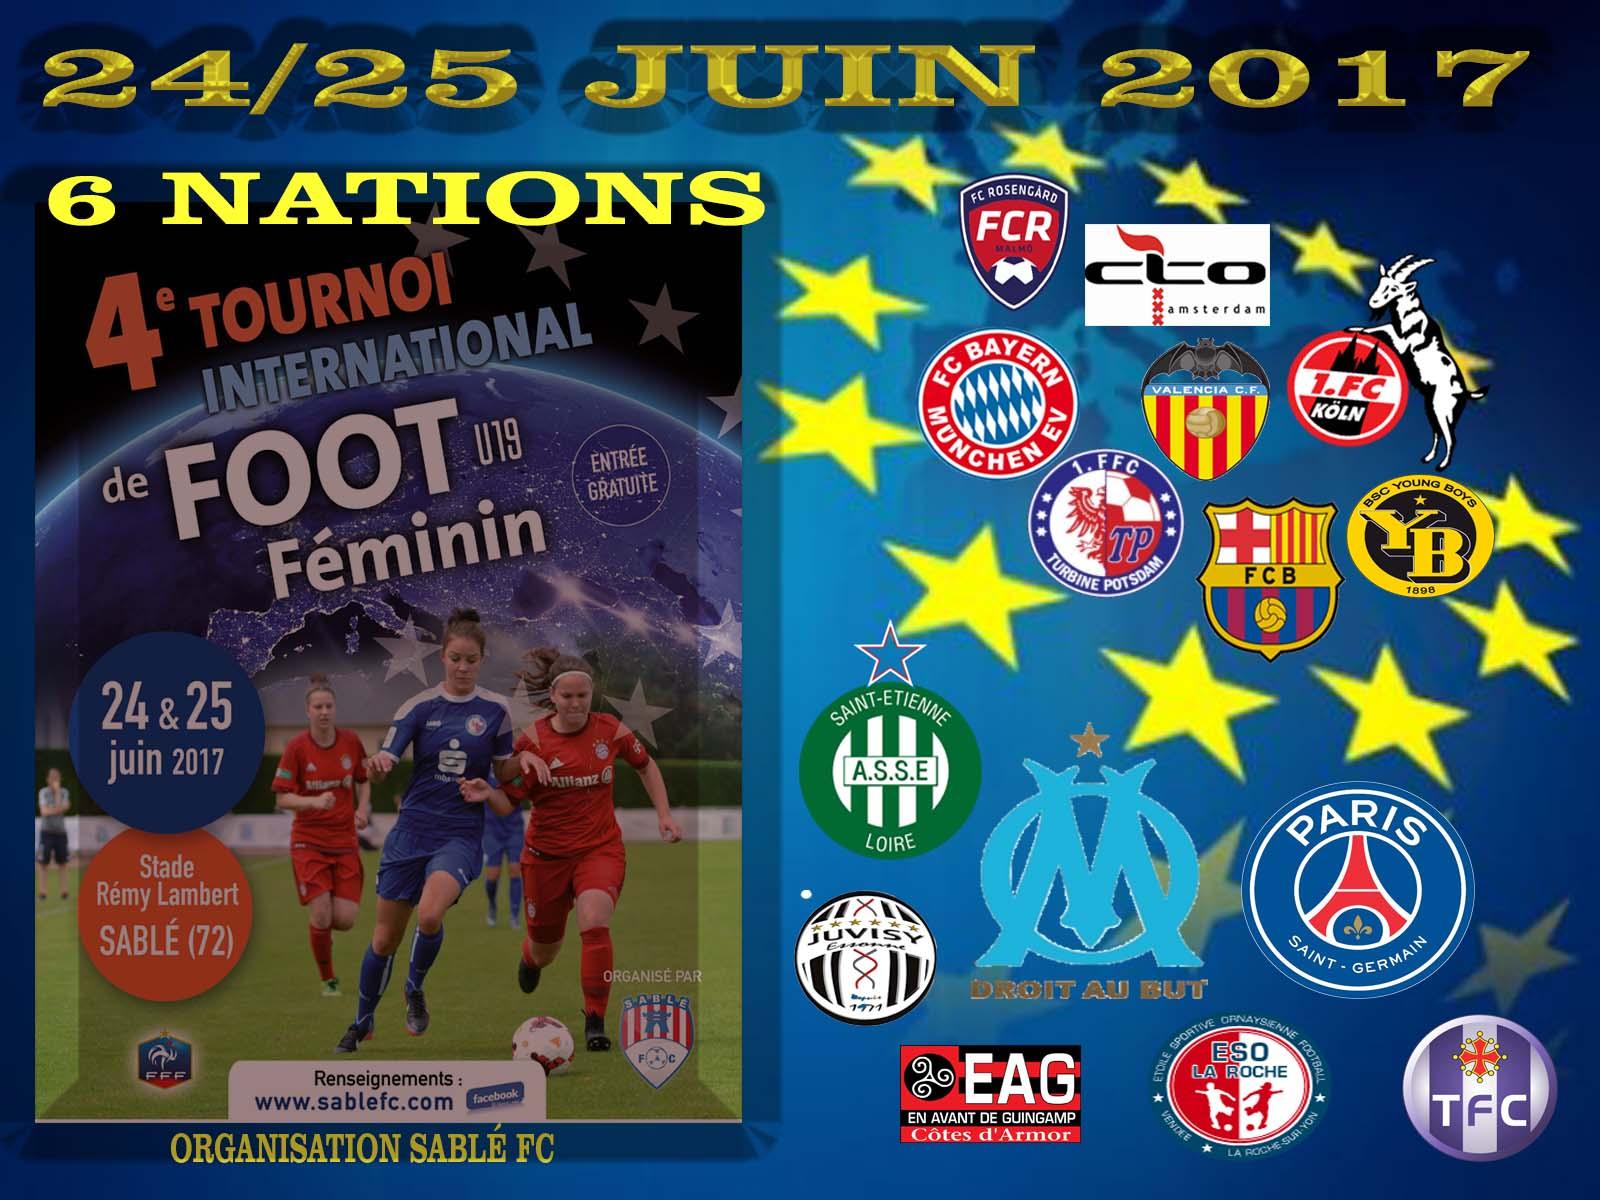 tournoi international fminin